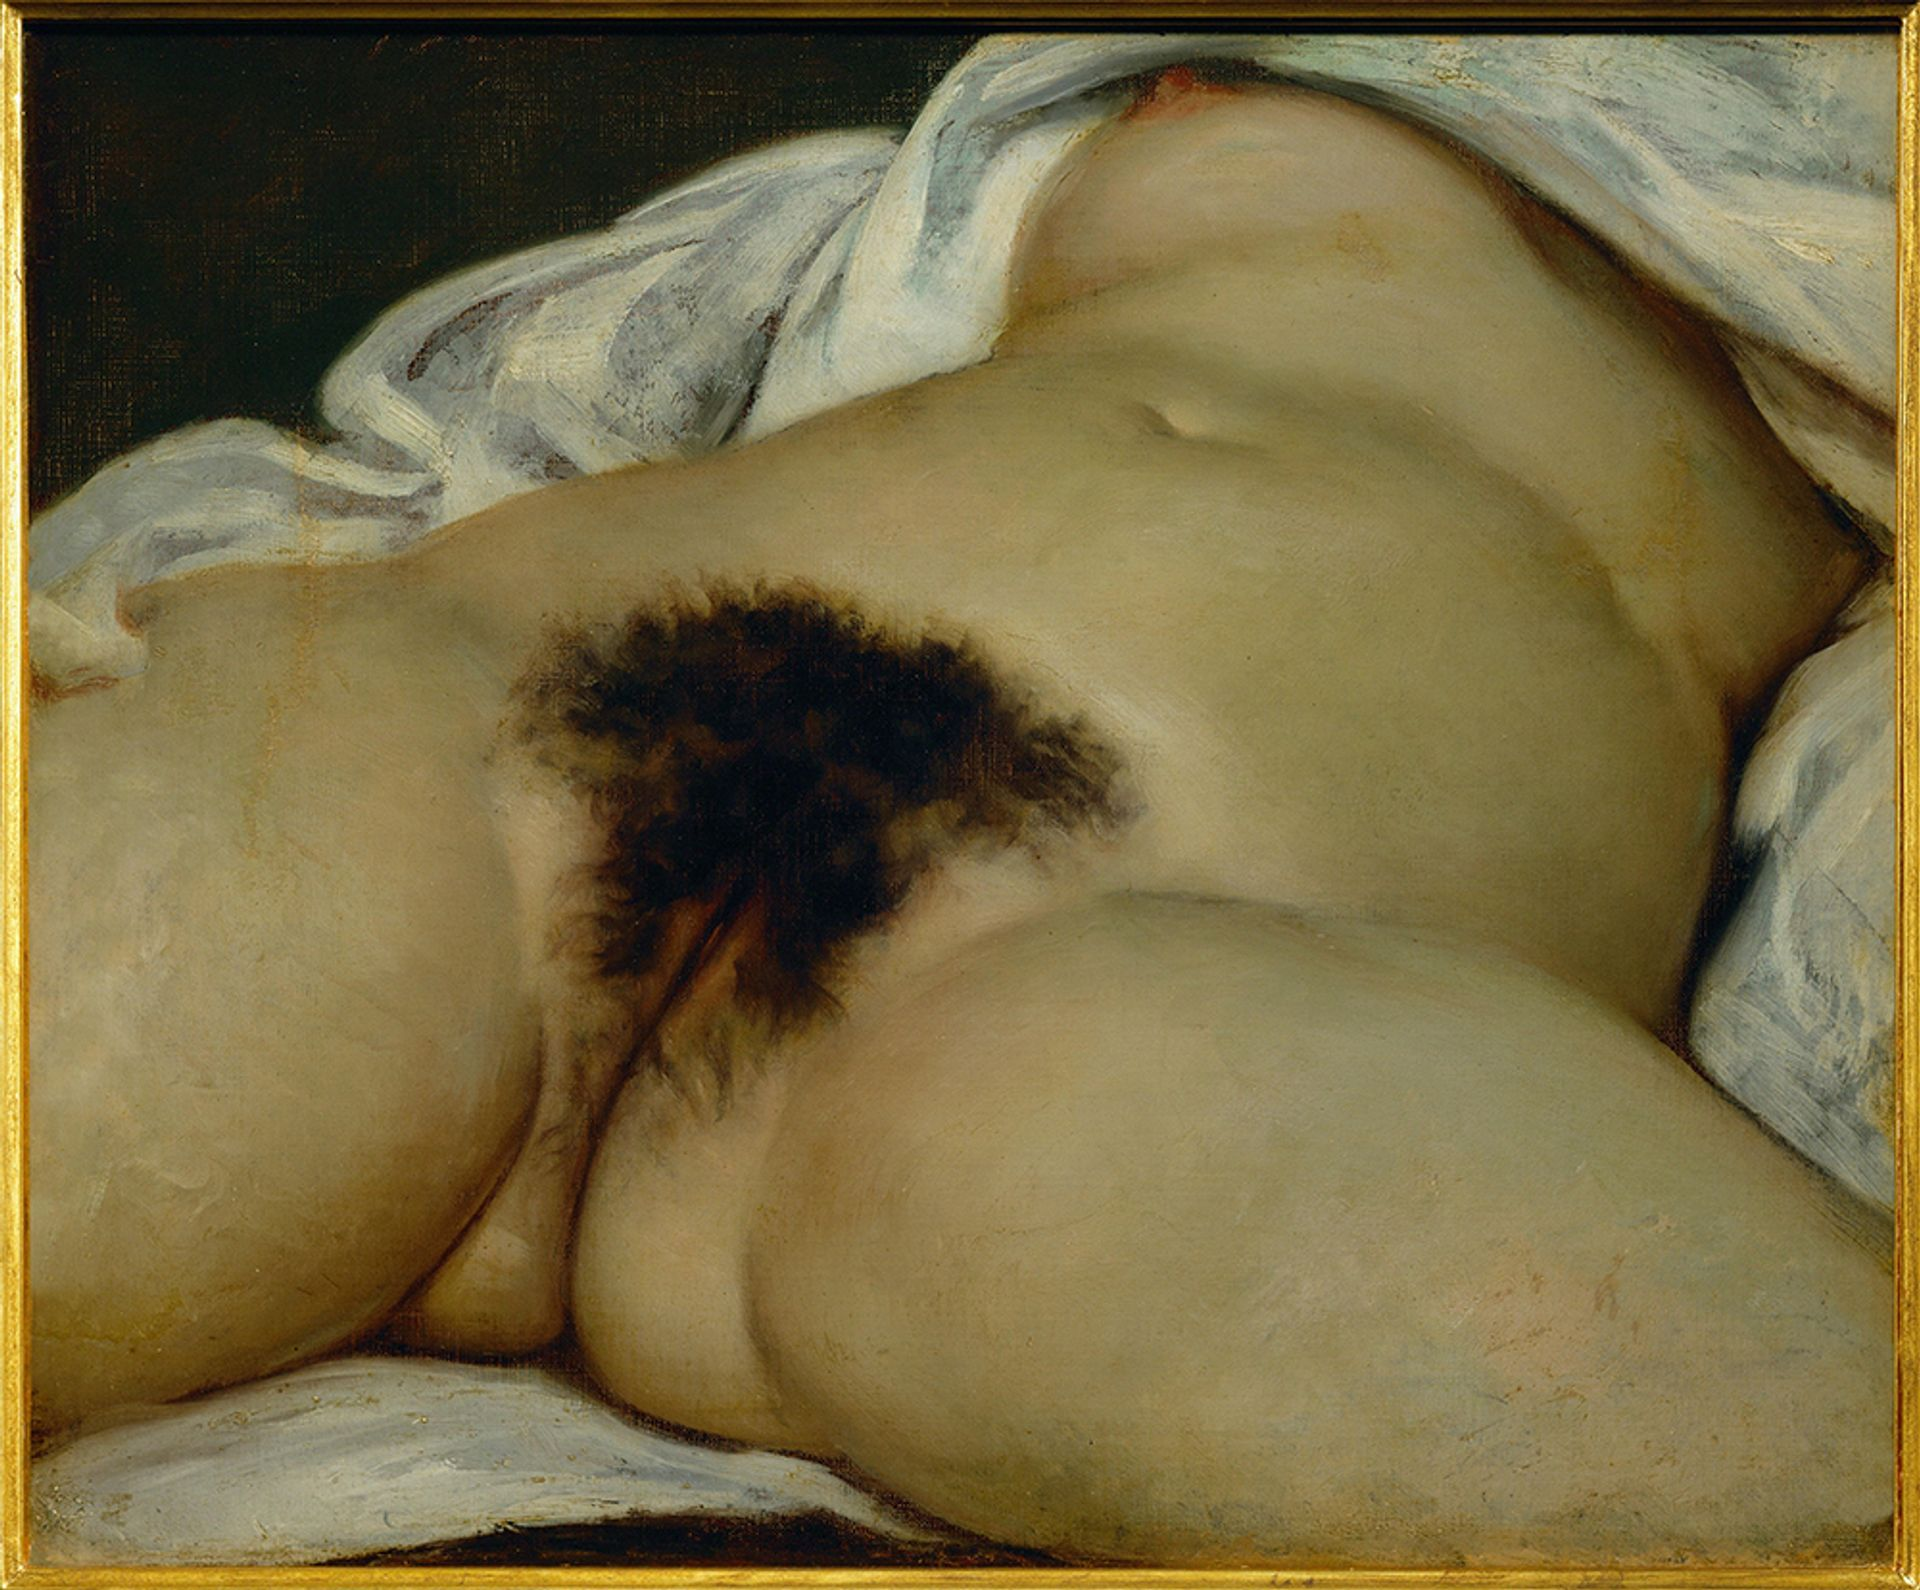 Gustave Courbet, L'Origine du monde (Origin of the World, 1866)